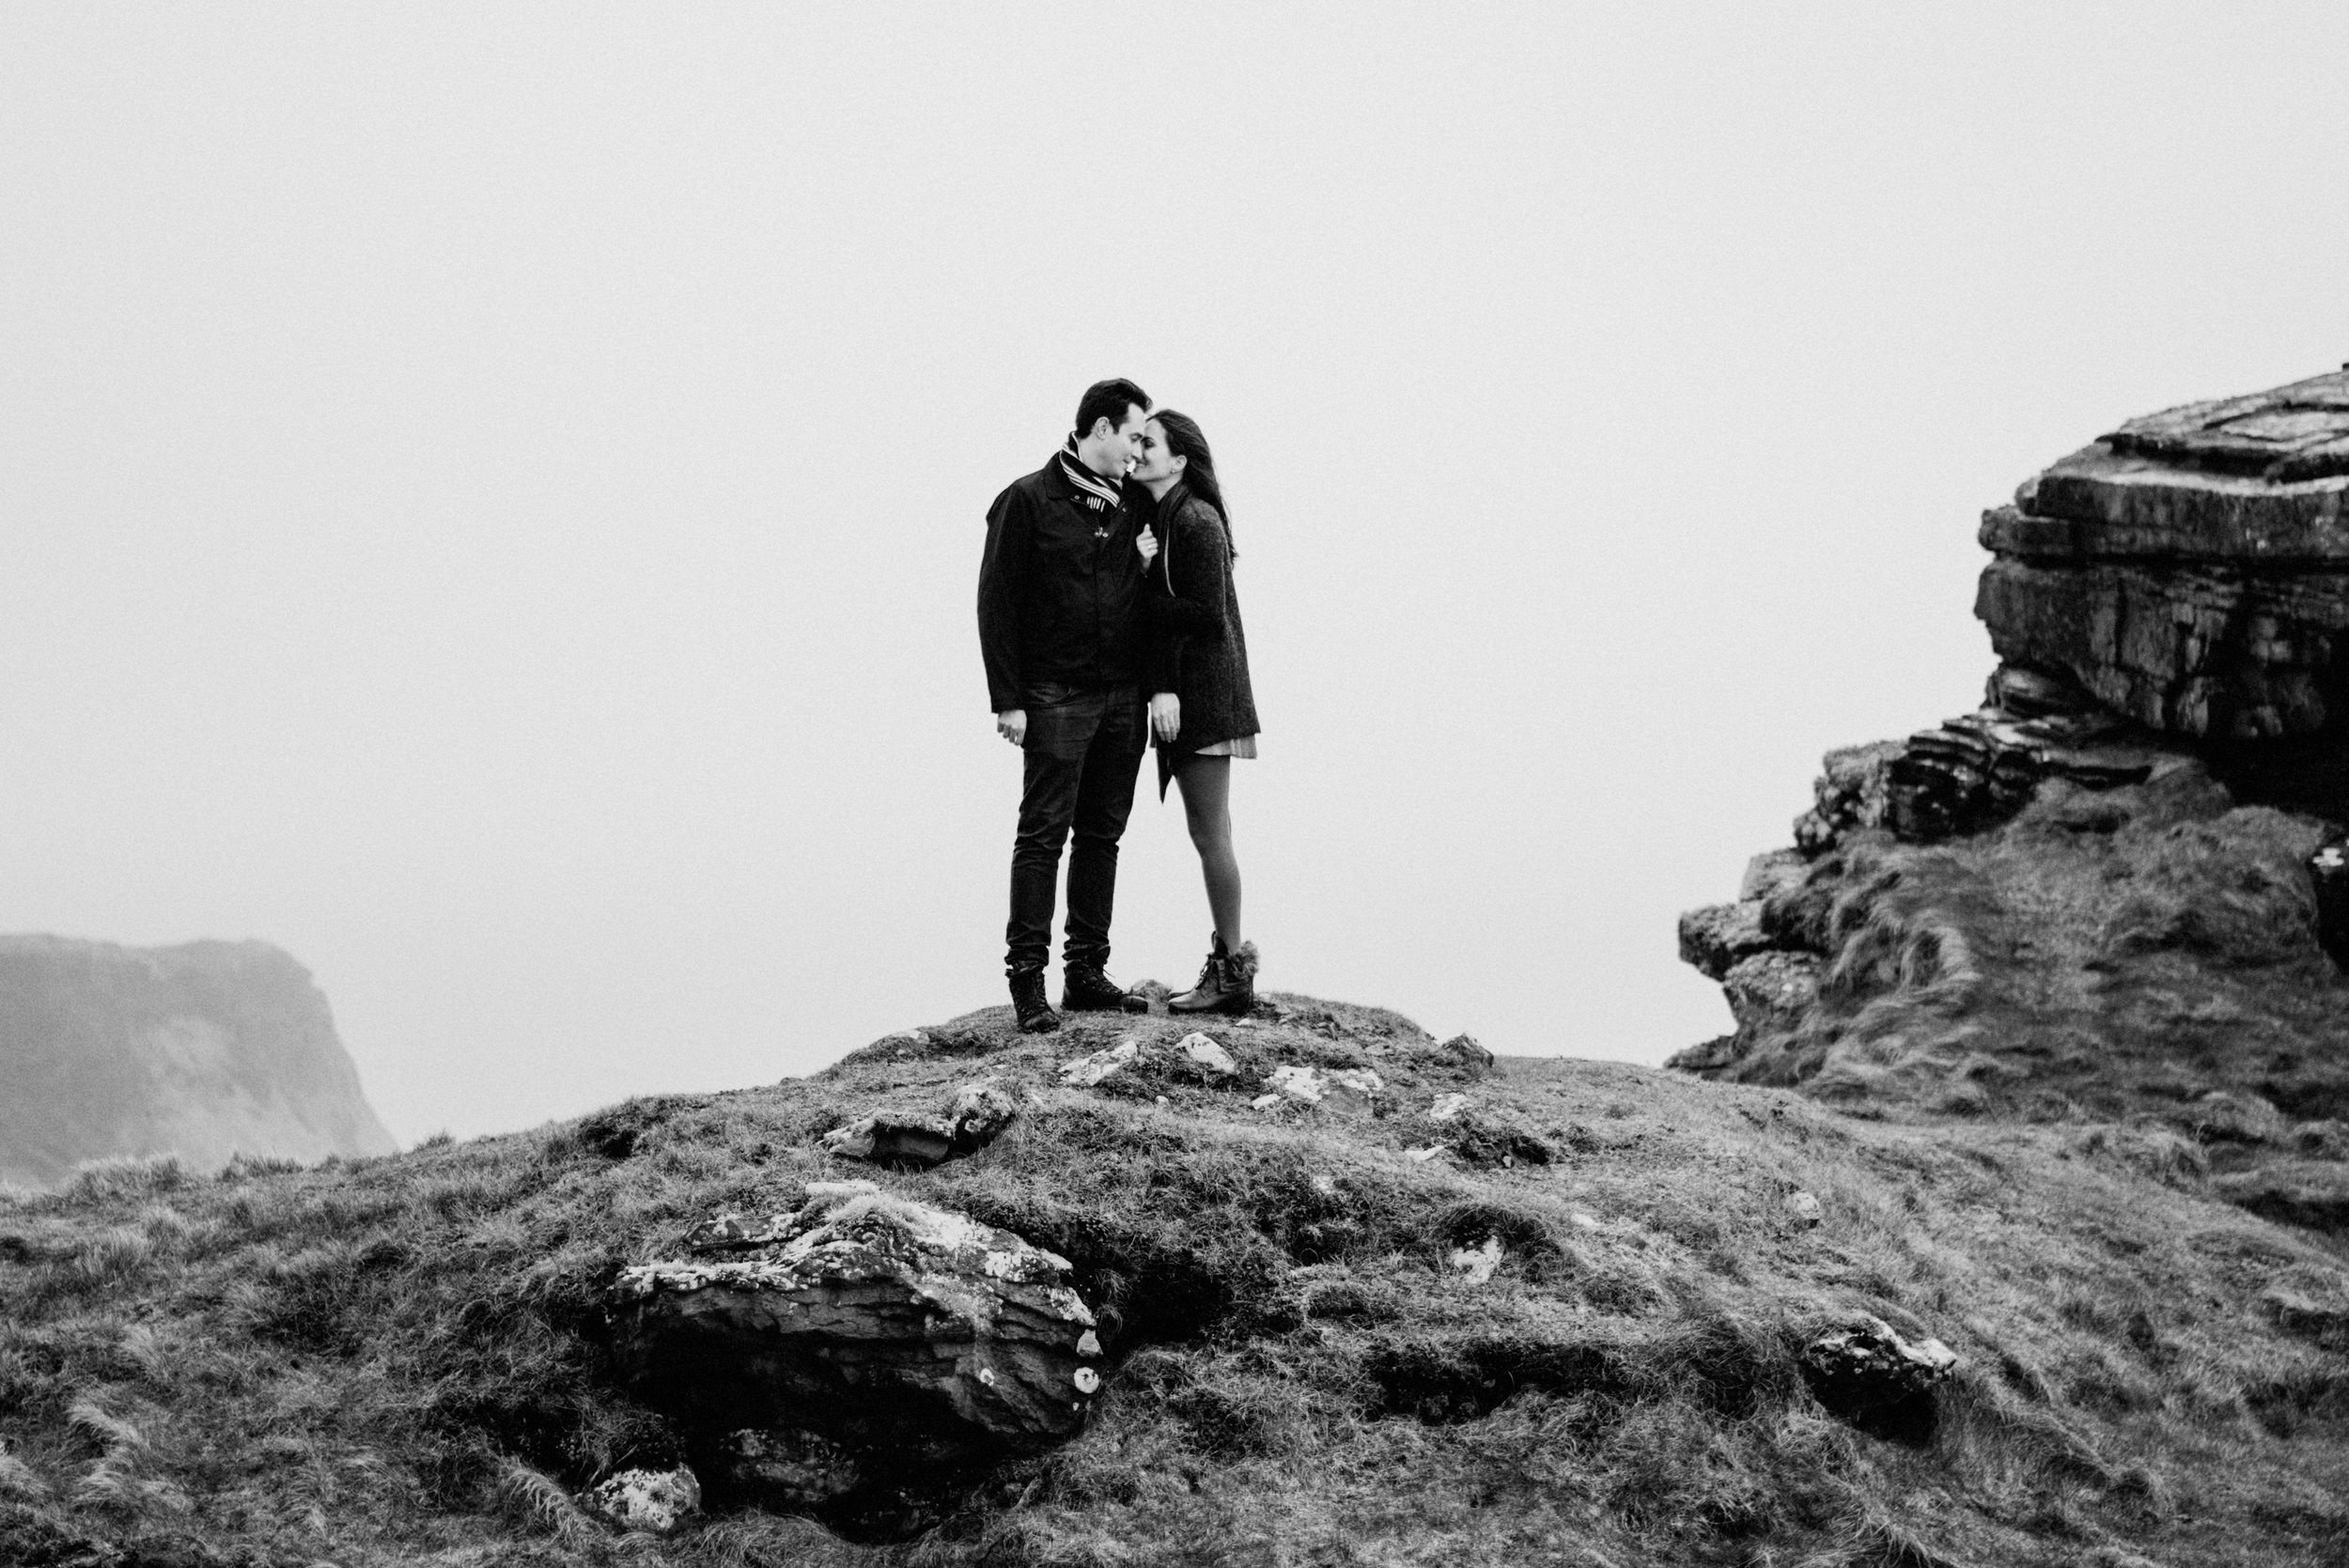 Cliffs Of Moher Engagement Session - Cliffs of Moher Proposal - Cliffs of Mhoer Elopement_6808-Edit-3.jpg